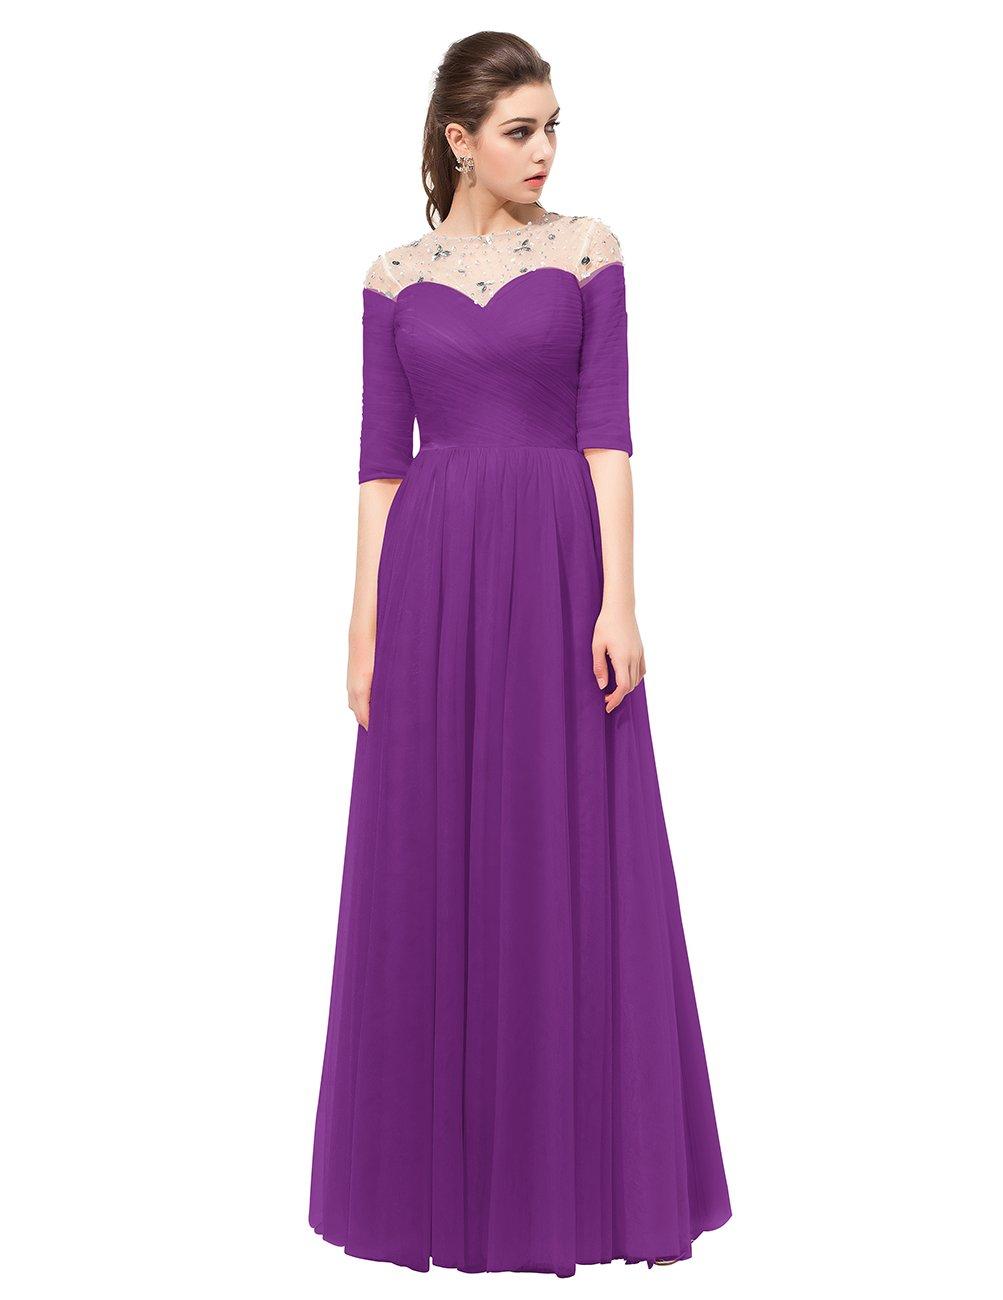 Dresstell レディーズ ロング丈 お呼ばれ 結婚式ドレス フォーマルドレス ビジュー付き カラーチュチュ 袖付き 花嫁ワンピース 二次会ドレス 編み上げ ダンスドレス B01N9O5X58 JP11|パープル パープル JP11